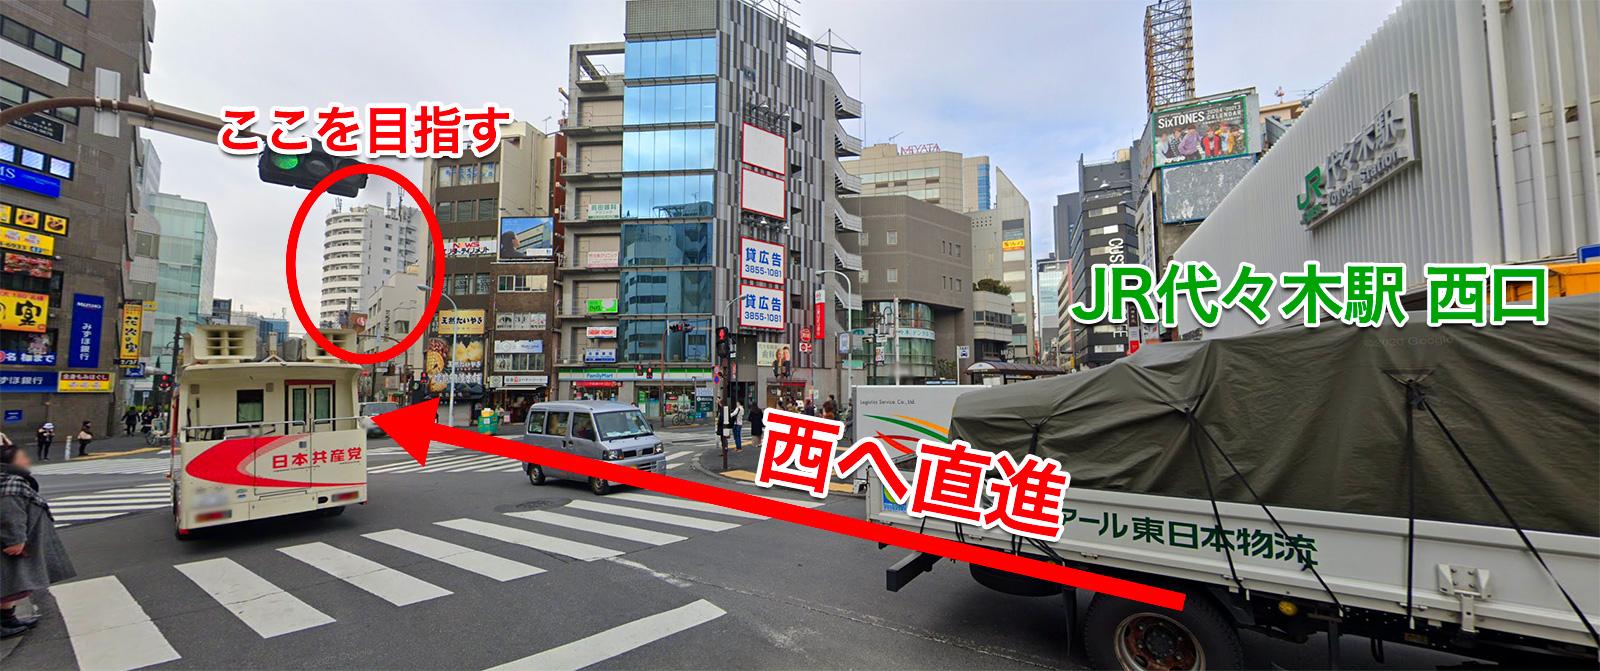 JR代々木駅から来る場合